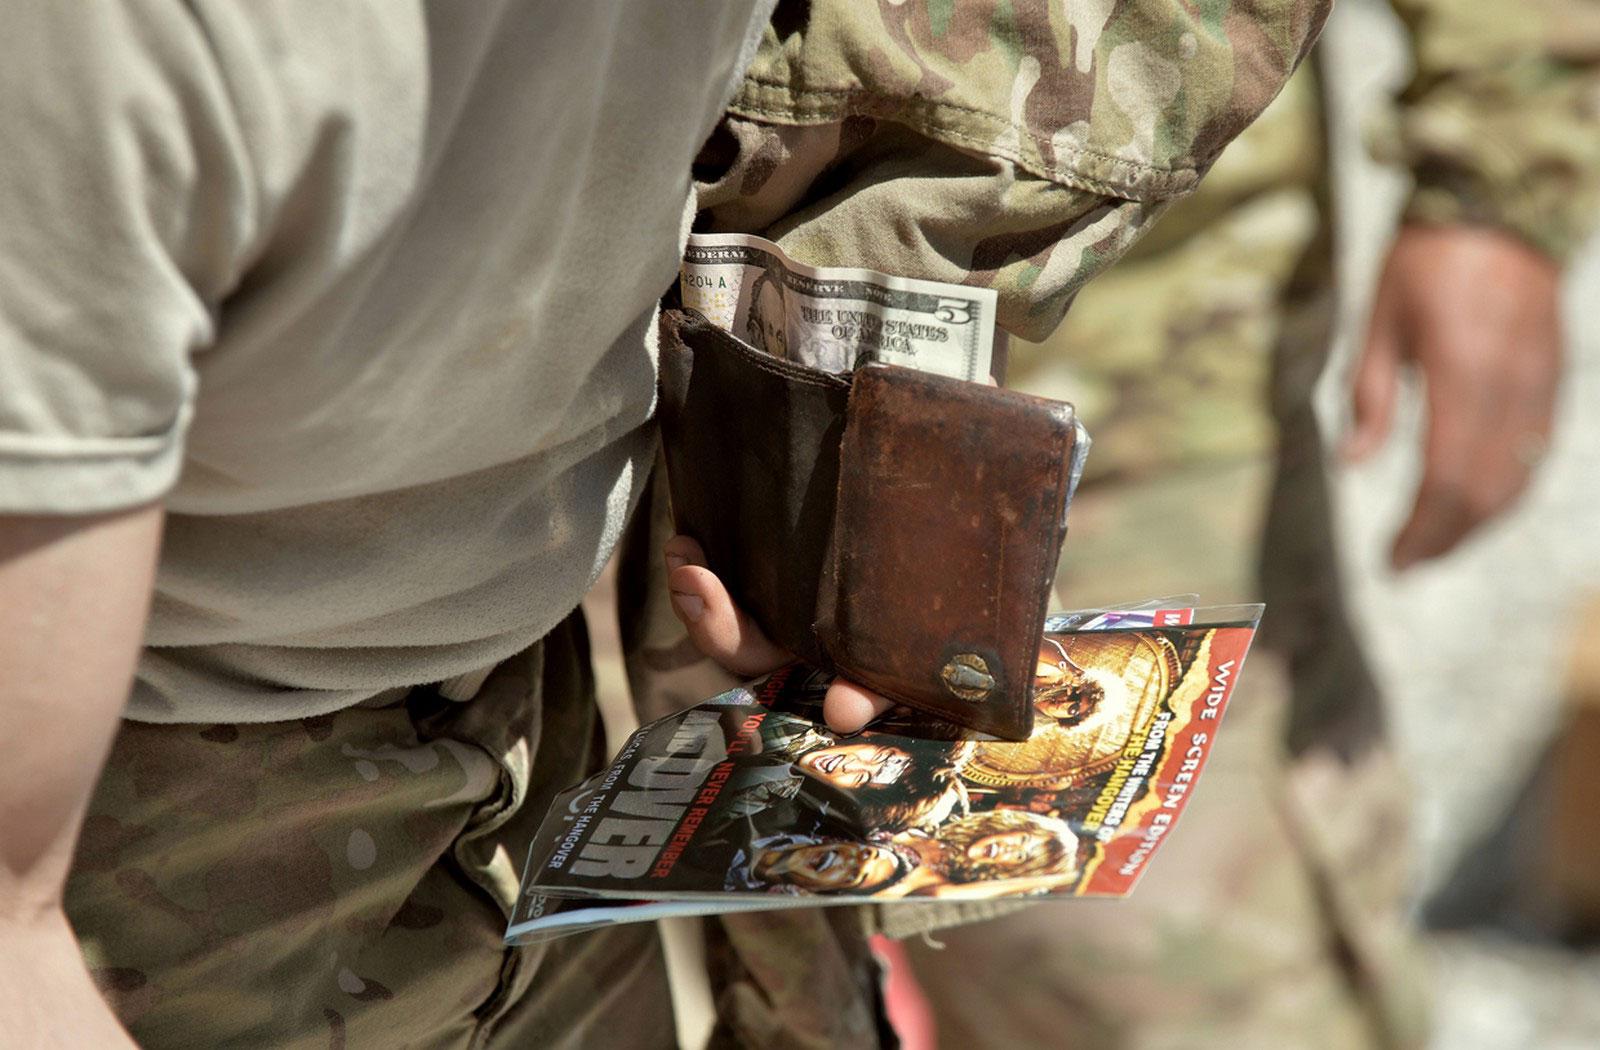 солдат покупает DVD-диски